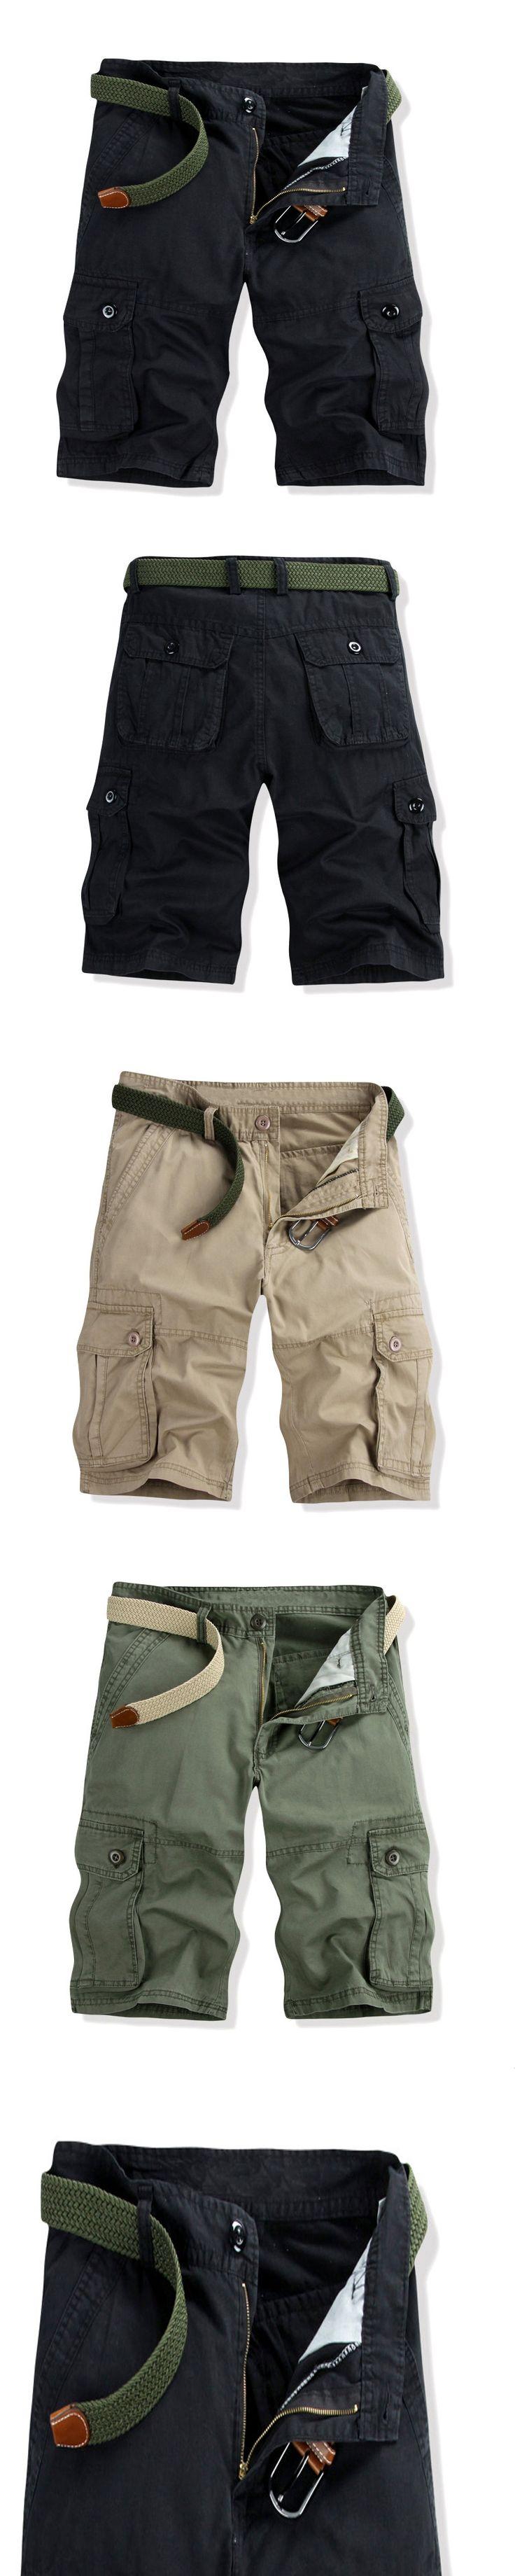 Hip pop Cotton Men's Cargo Shorts Multi pockets Green Size 28-40 Black Khaki Military Army Combat